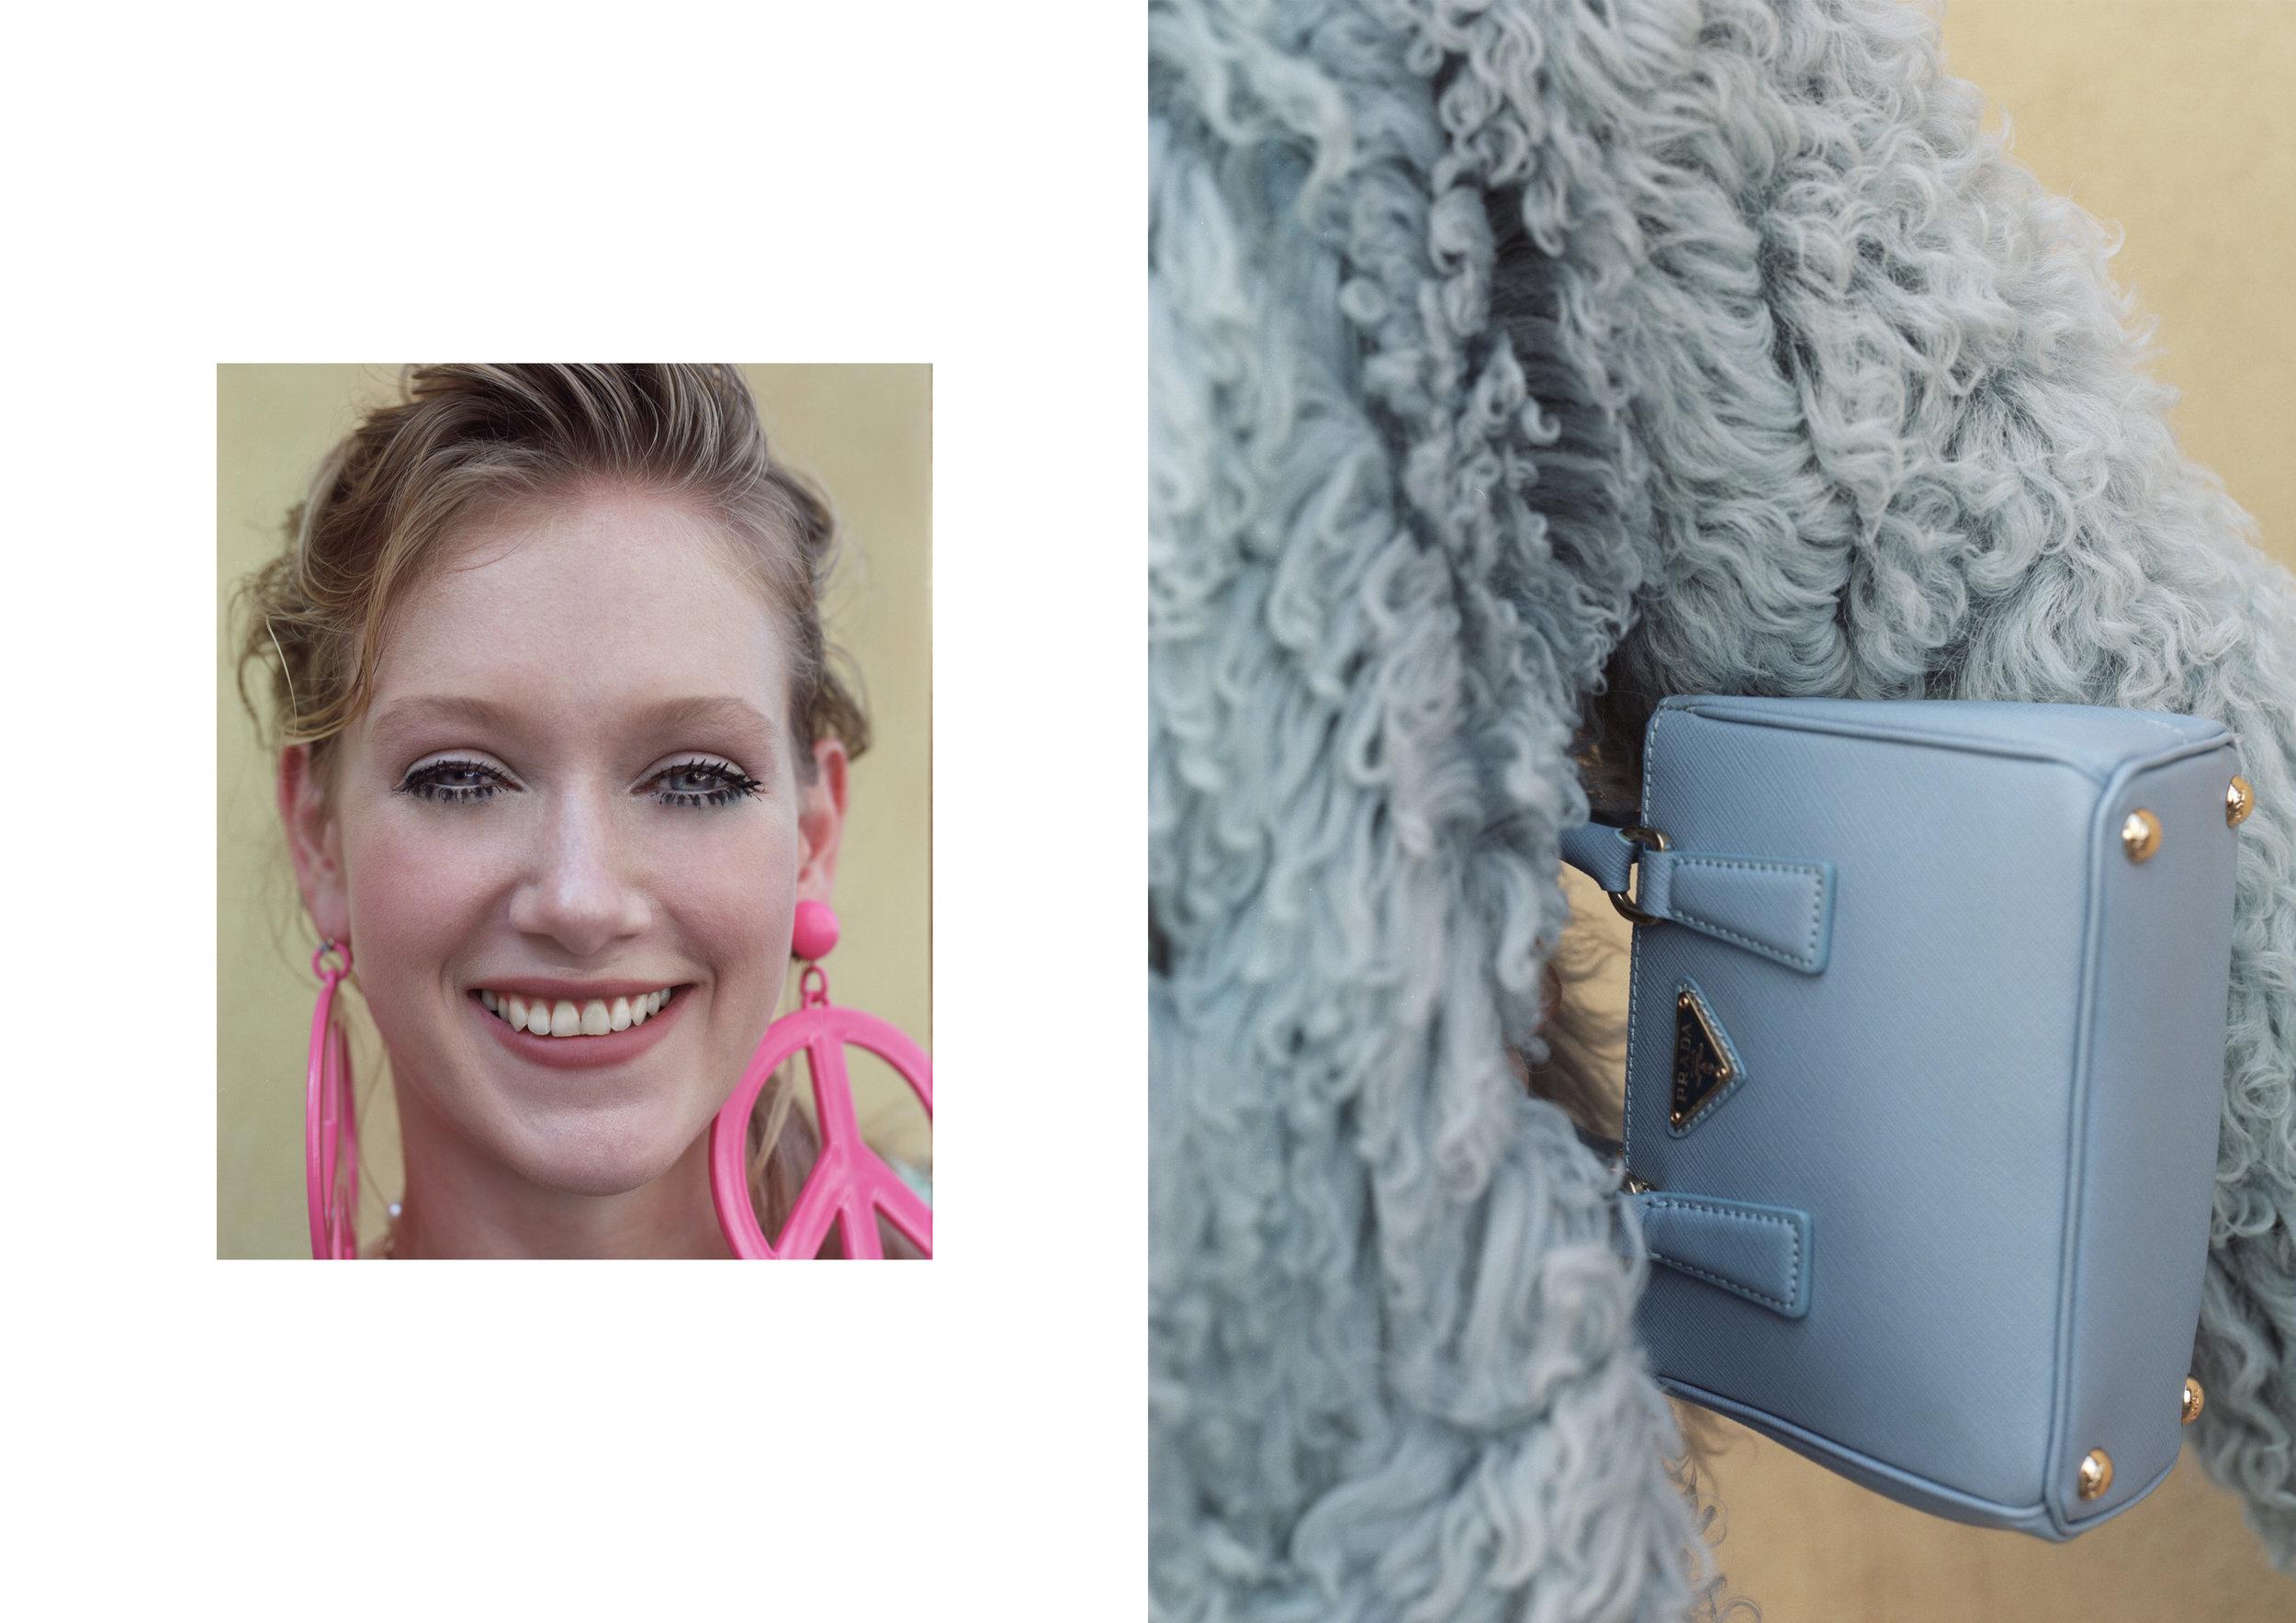 earrings MOSCHINO, fur GUCCI, bag PRADA